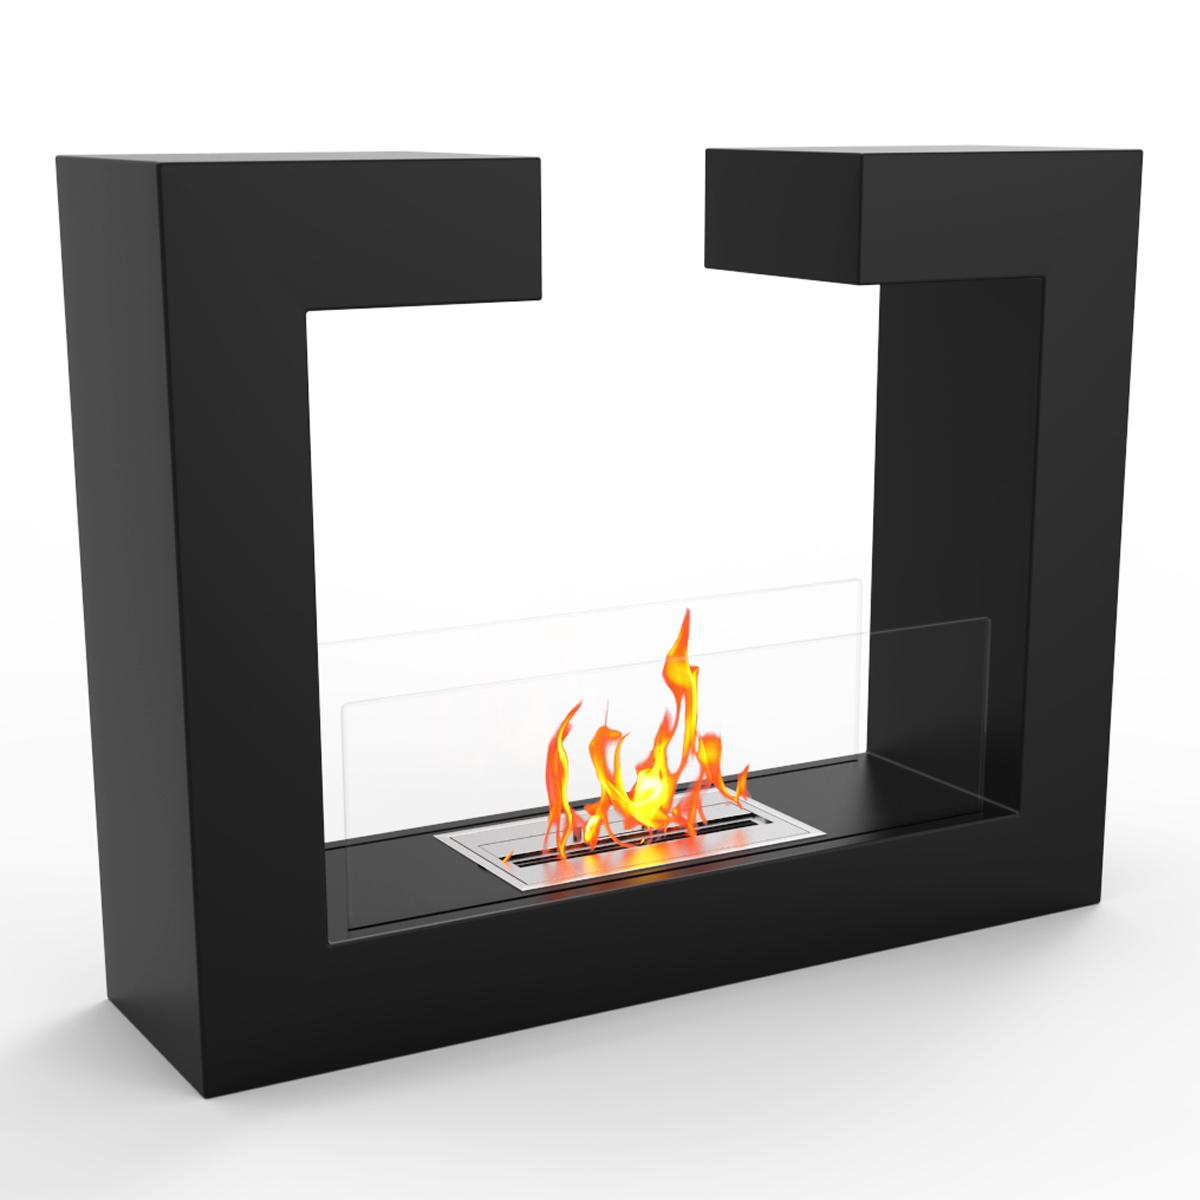 Vinci Ventless Free Standing Ethanol Fireplace In Black